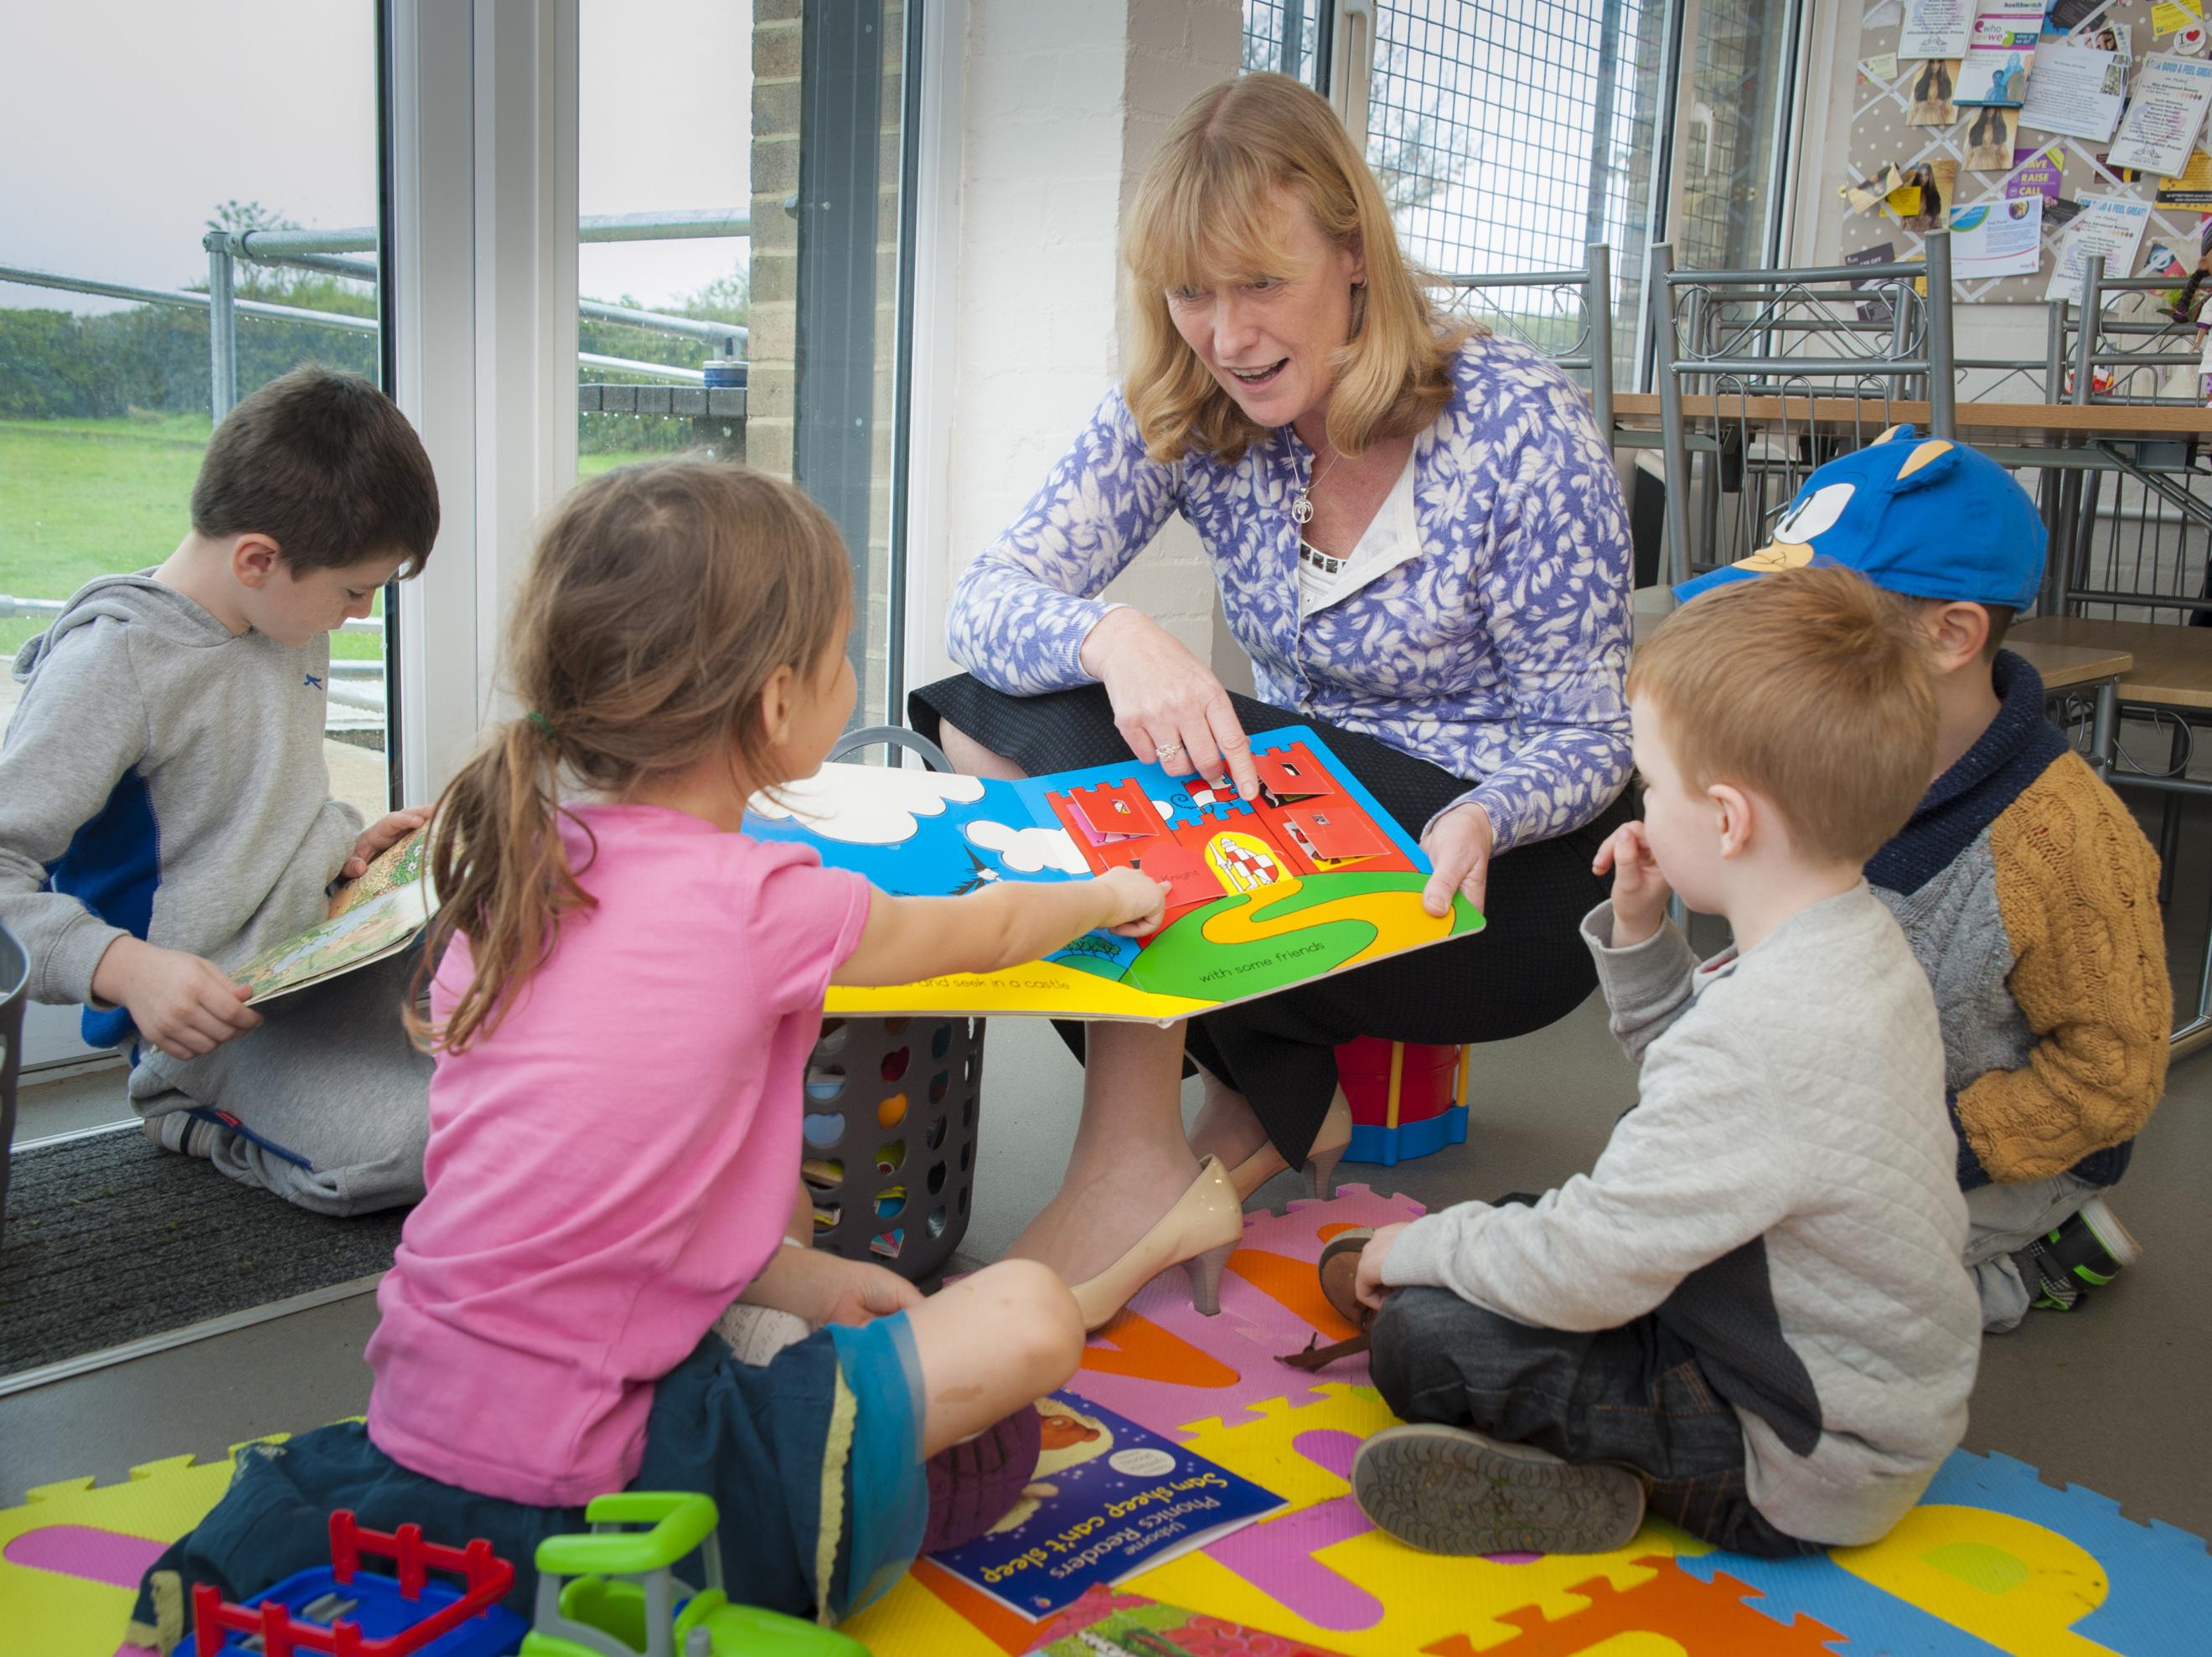 9._September_-_Education_and_Childcare_(option_2).jpg